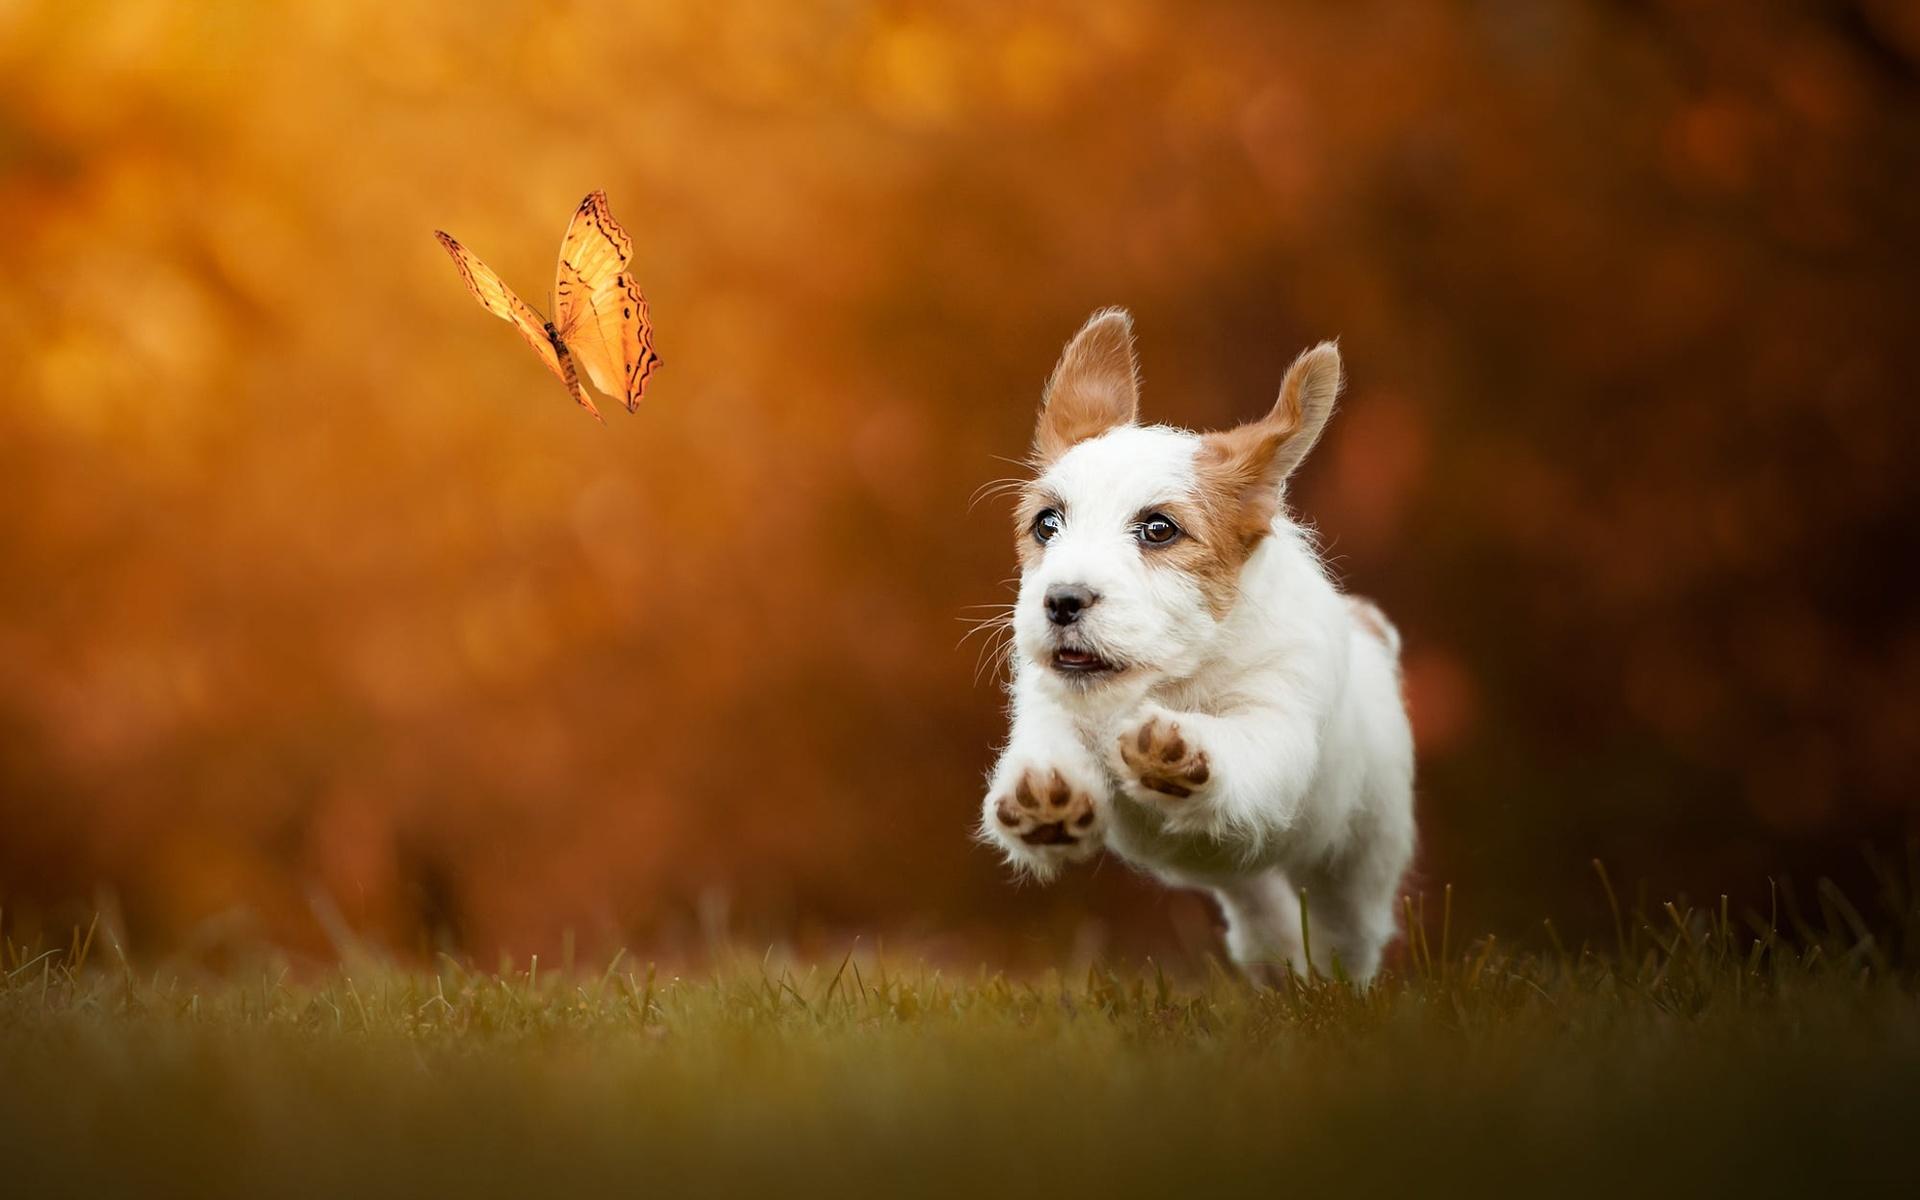 животное, собака, щенок, детёныш, бег, бабочка, трава, боке, джек-рассел, терьер